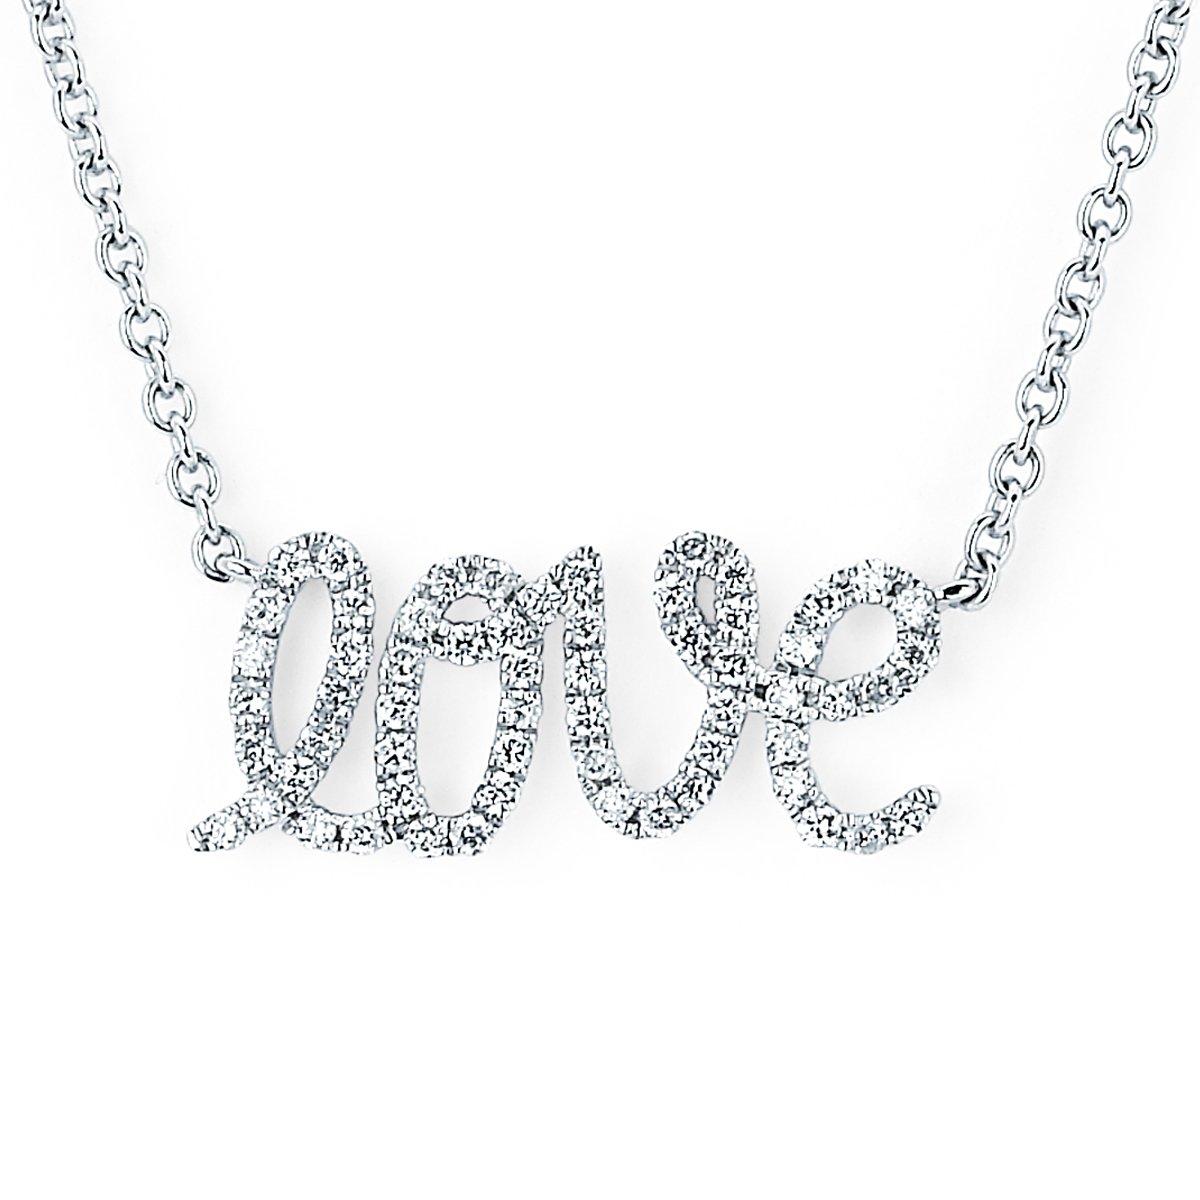 14K White Gold 0.14 Cttw. White Diamond Cursive Script ''Love'' Necklace with 18'' Chain